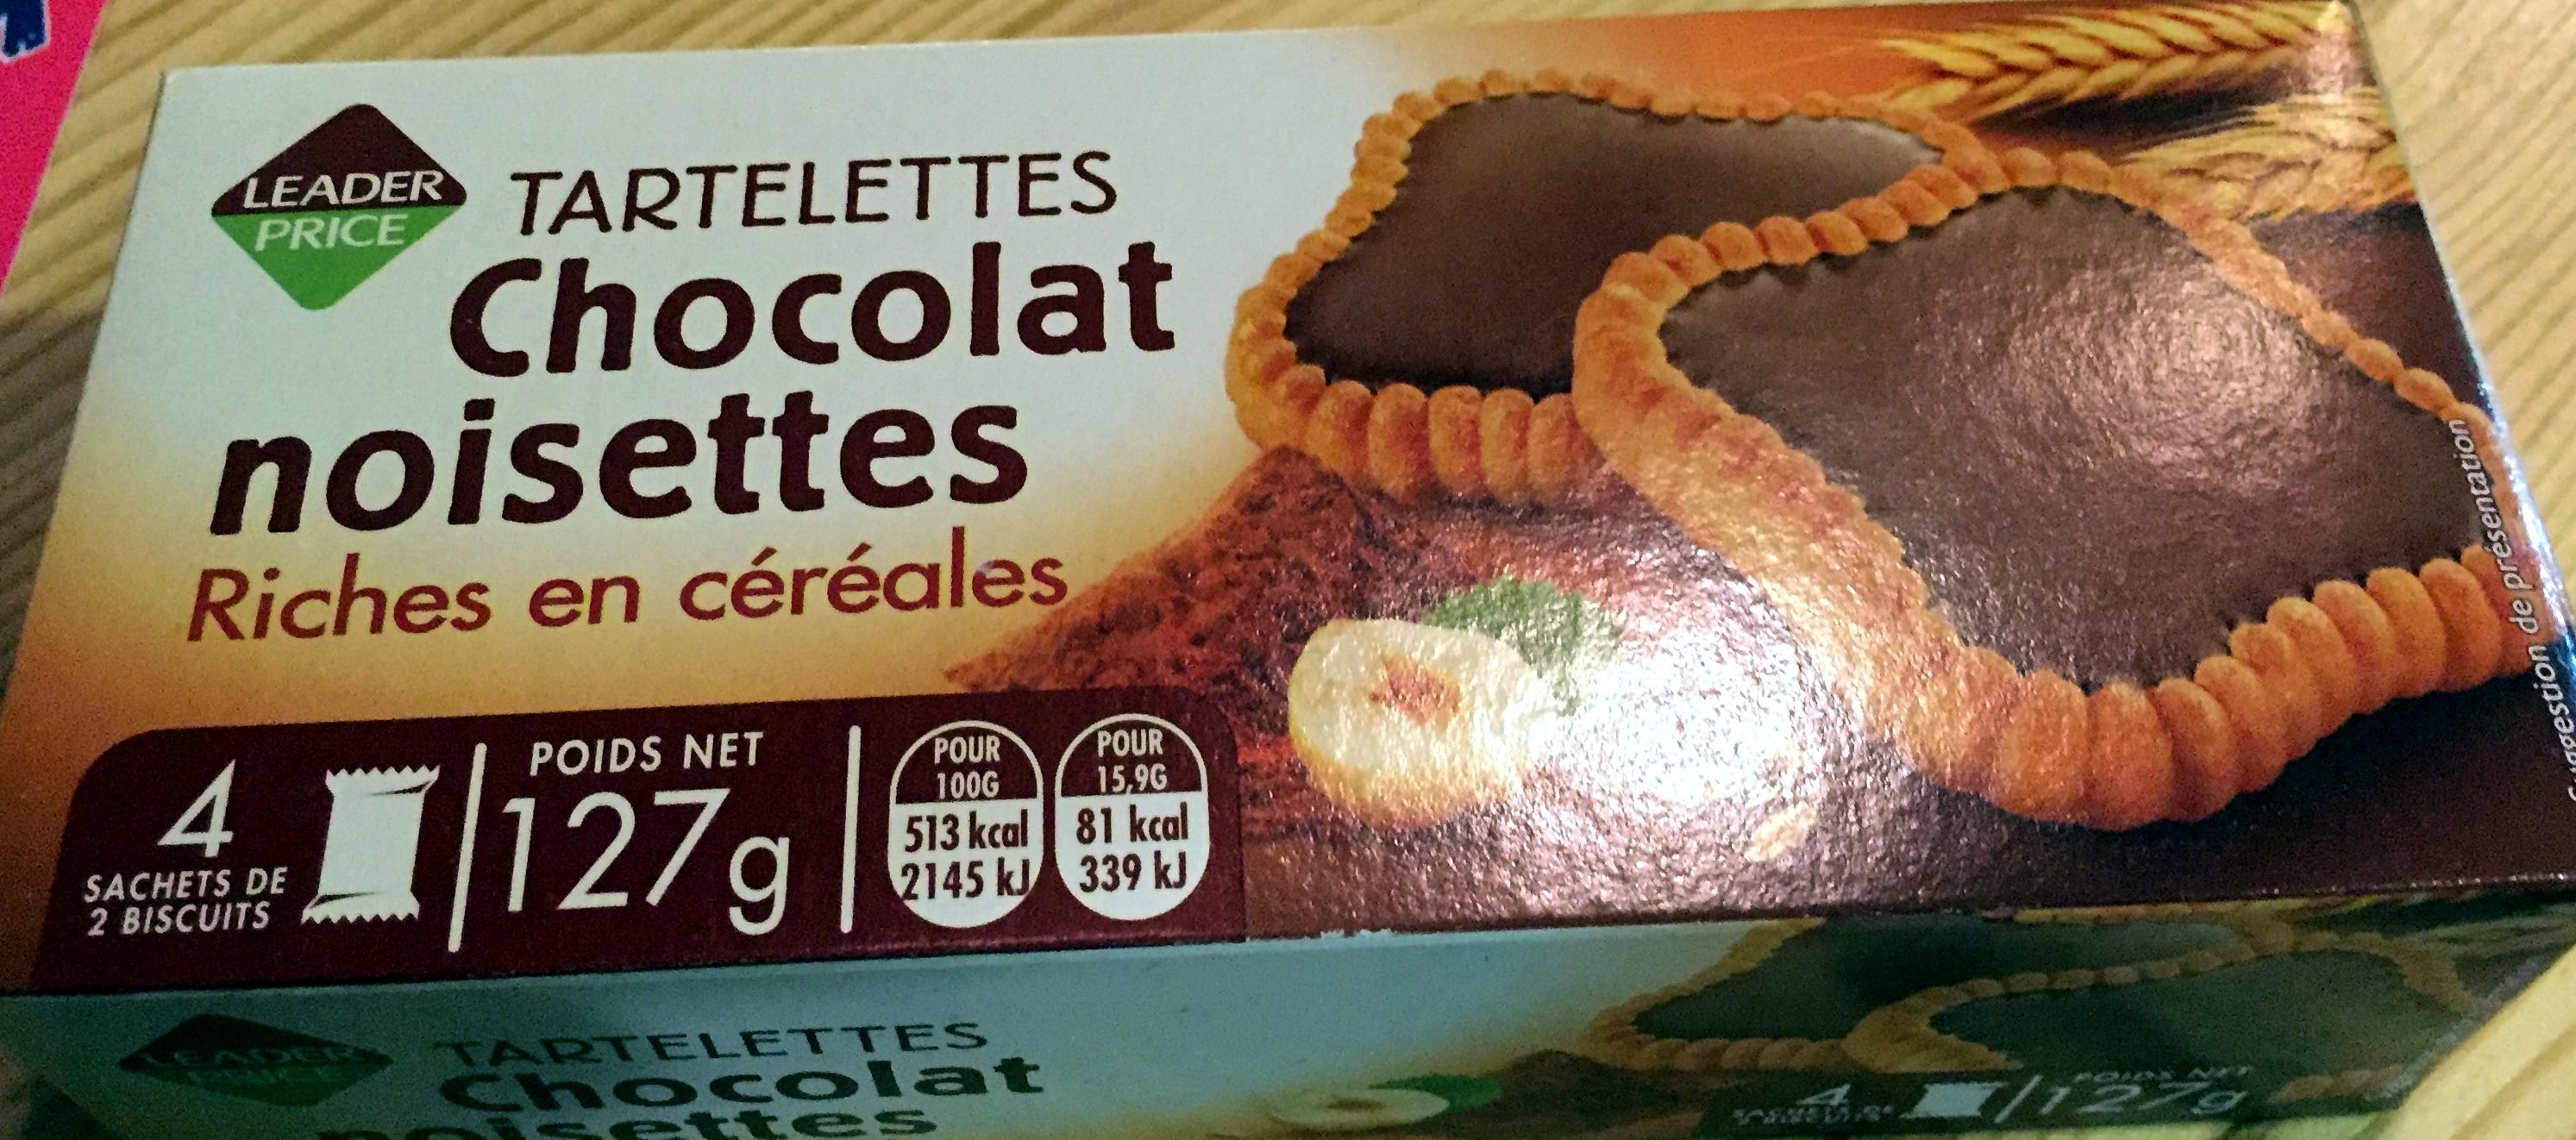 Tartelettes chocolat noisettes - Product - fr